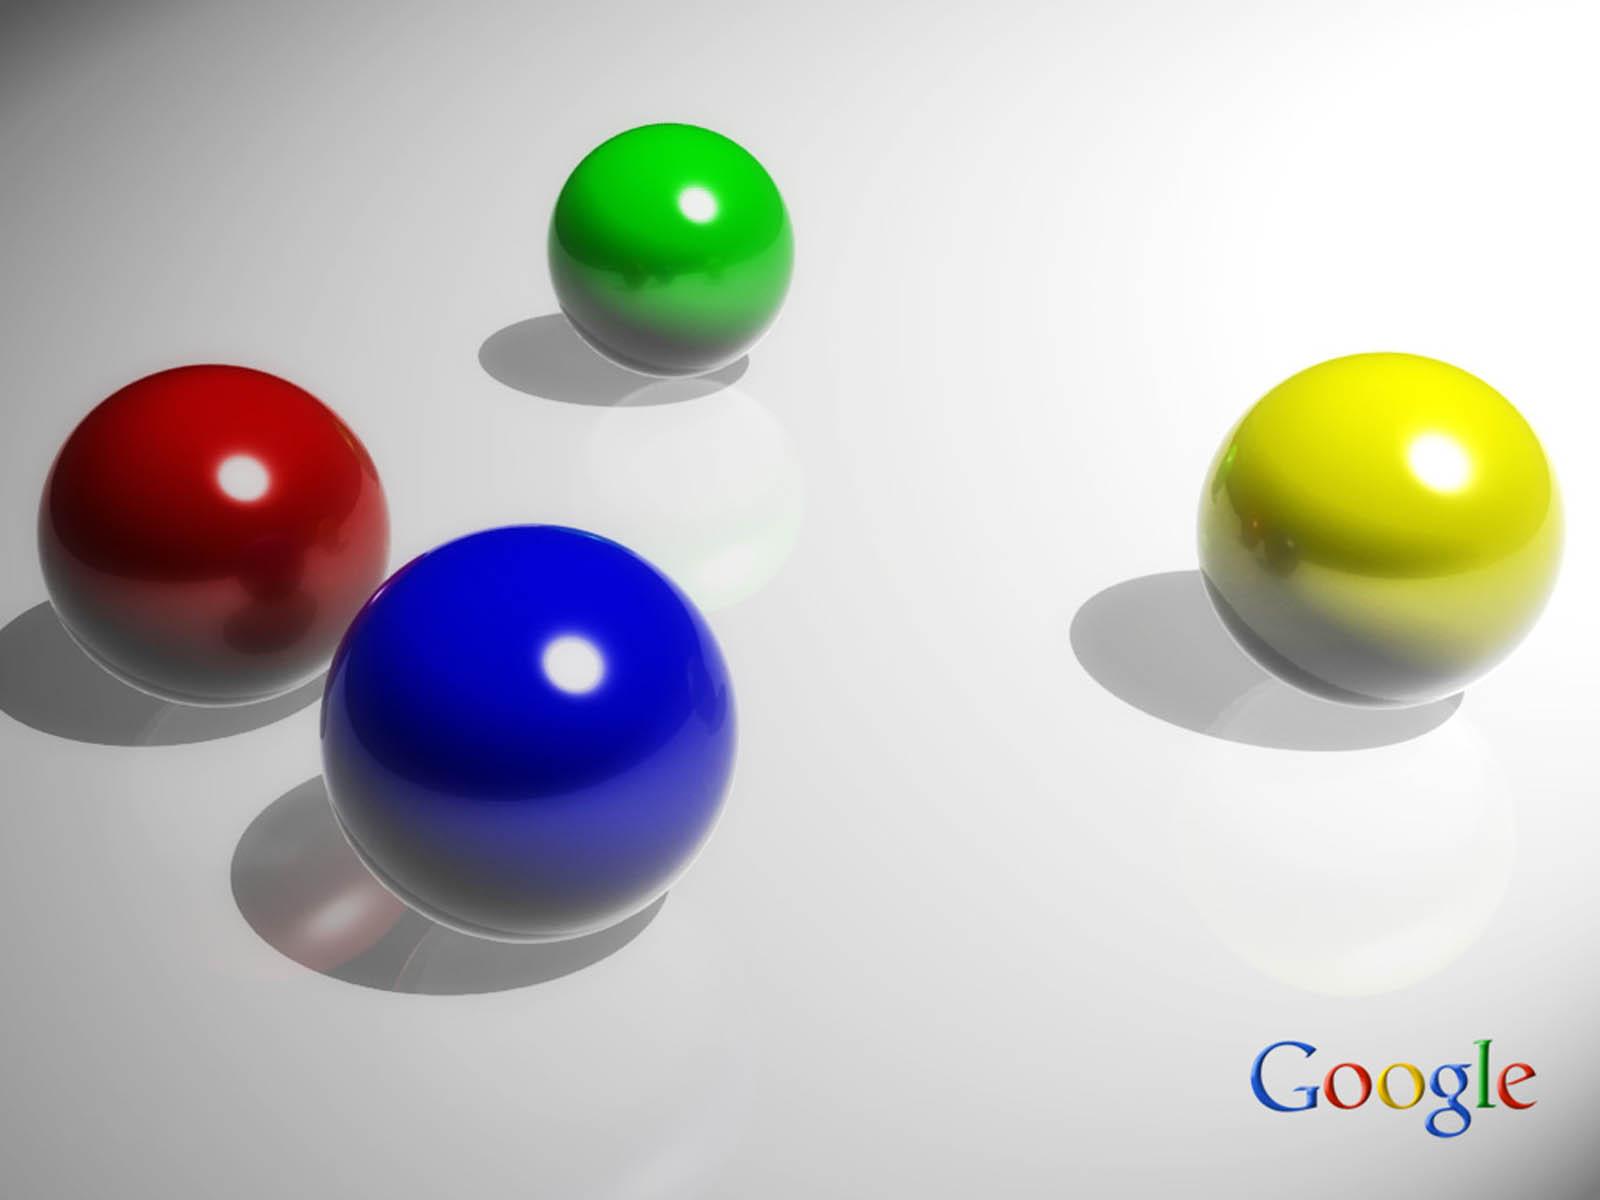 Google Wallpapers for Desktop Wallpaper 1600x1200